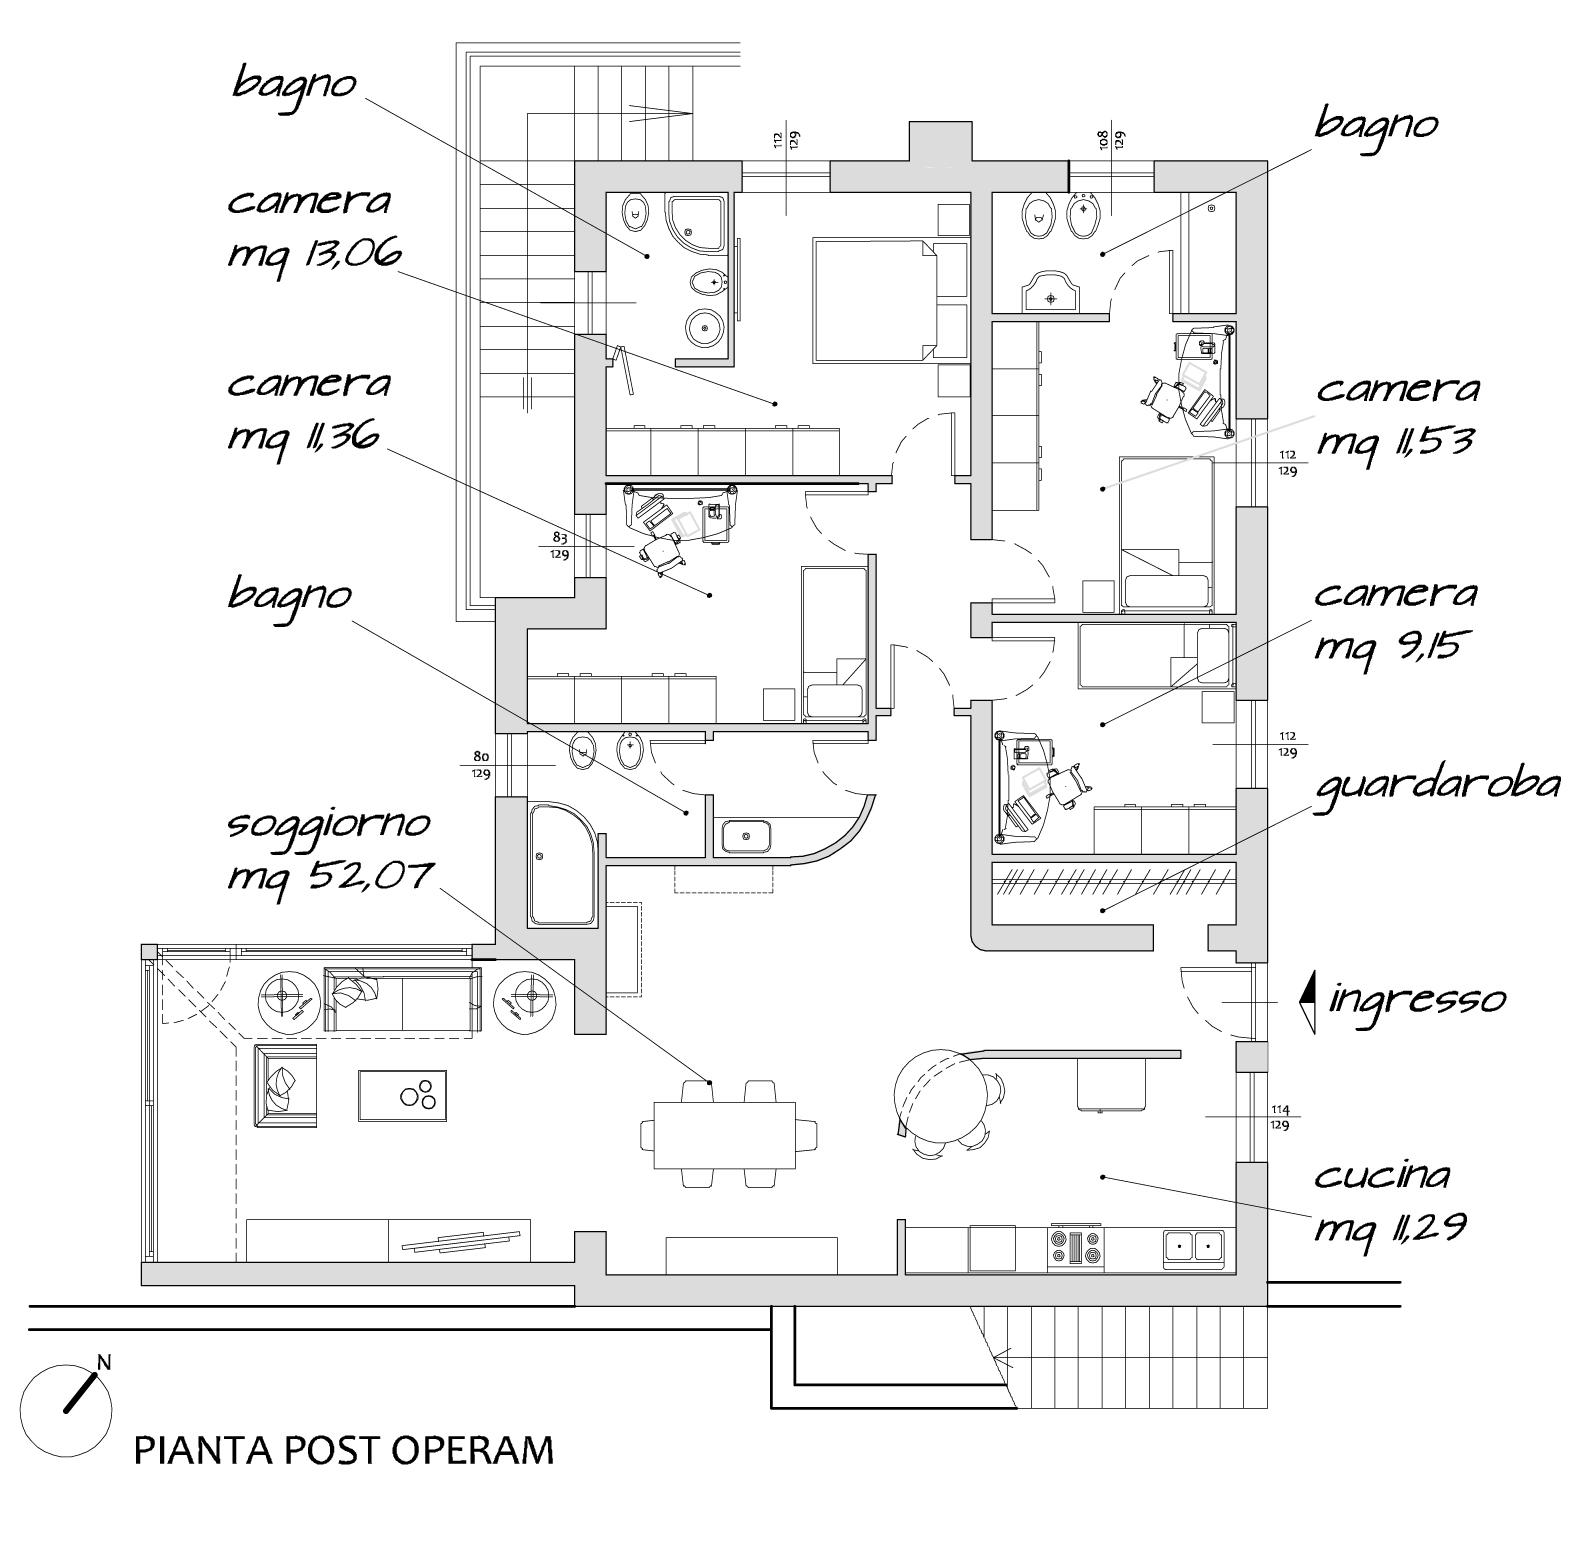 Villa moderna planimetria dormelletto villa moderna in for Planimetrie in stile fienile